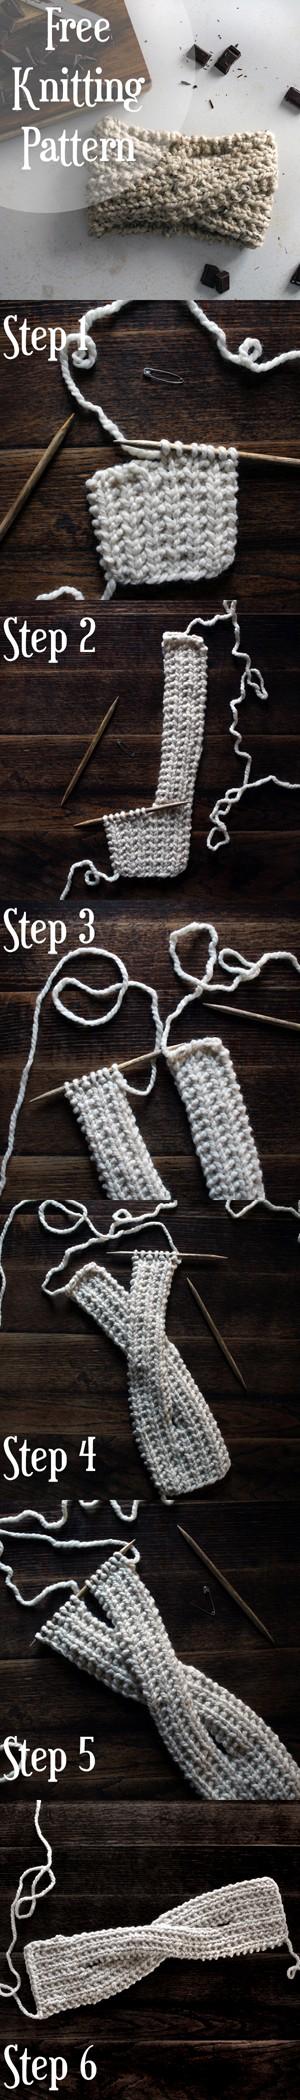 FREE ADVENTUROUS : Headband Knitting Pattern by Brome Fields